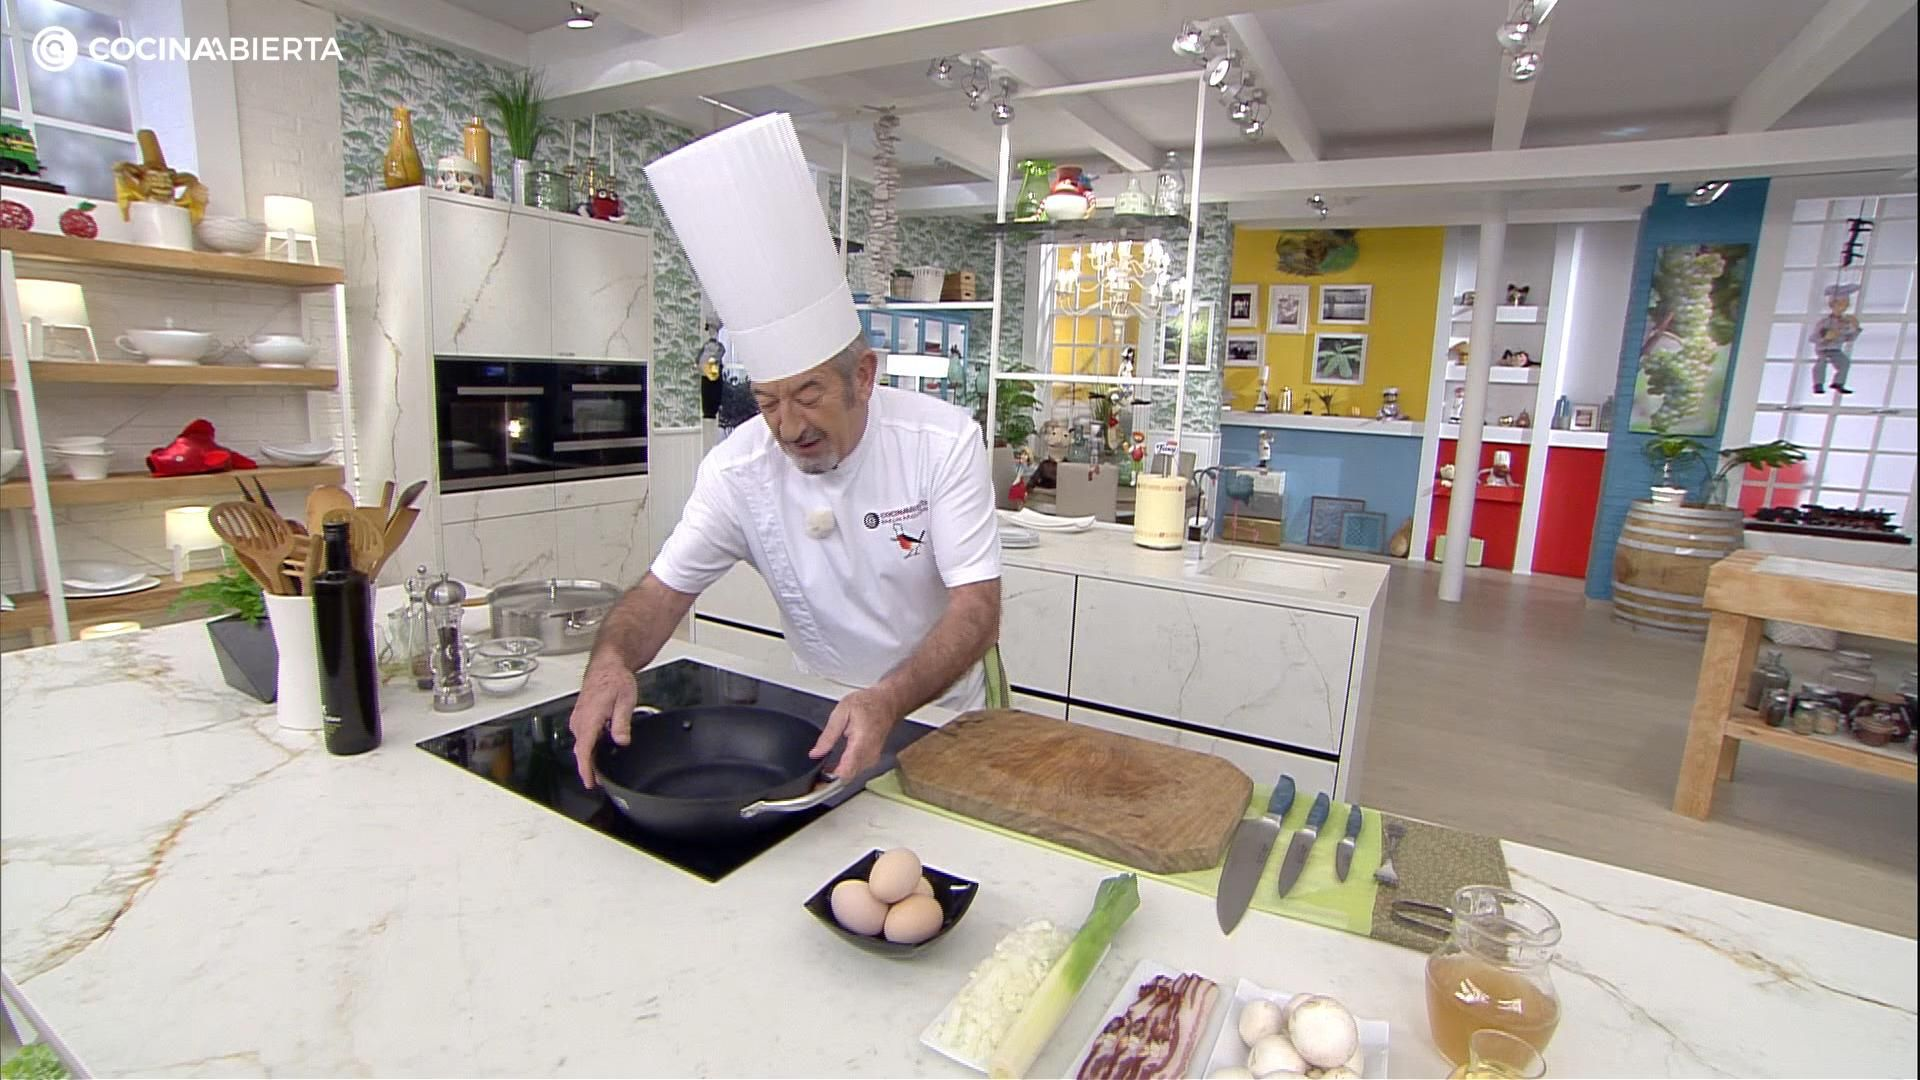 Huevos Con Salsa Bretona Receta De Karlos Arguiñano En Cocina Abierta Hogarmania Video Video Recetas Karlos Arguiñano Recetas Economicas